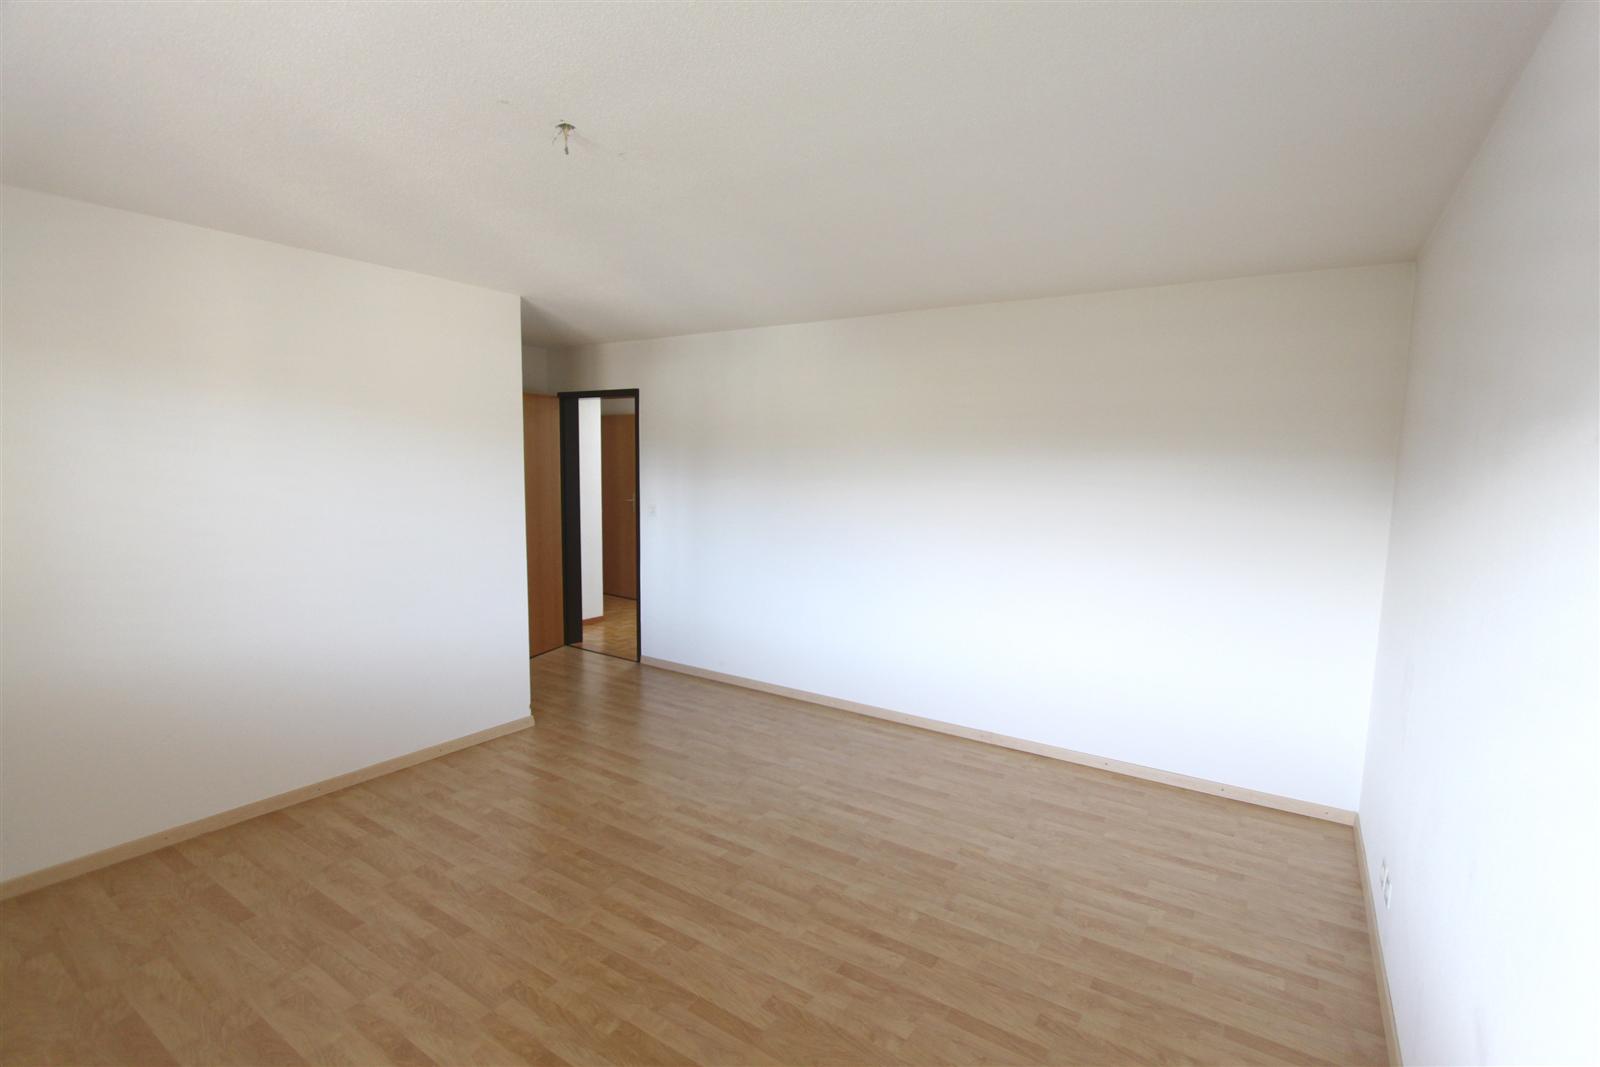 03 Interior Rosenhalde - 006